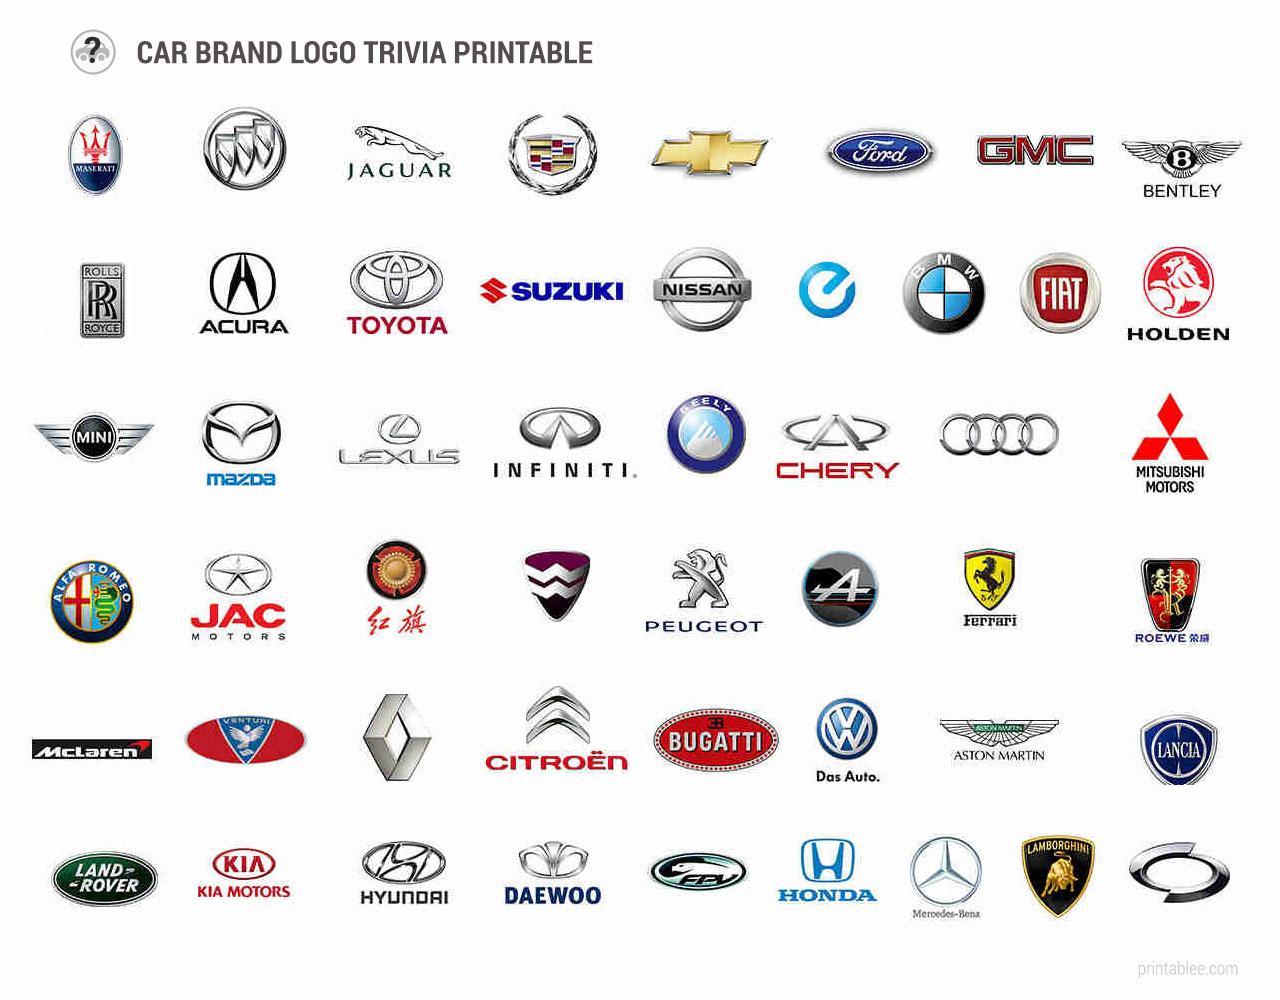 Printable car brands logo trivia